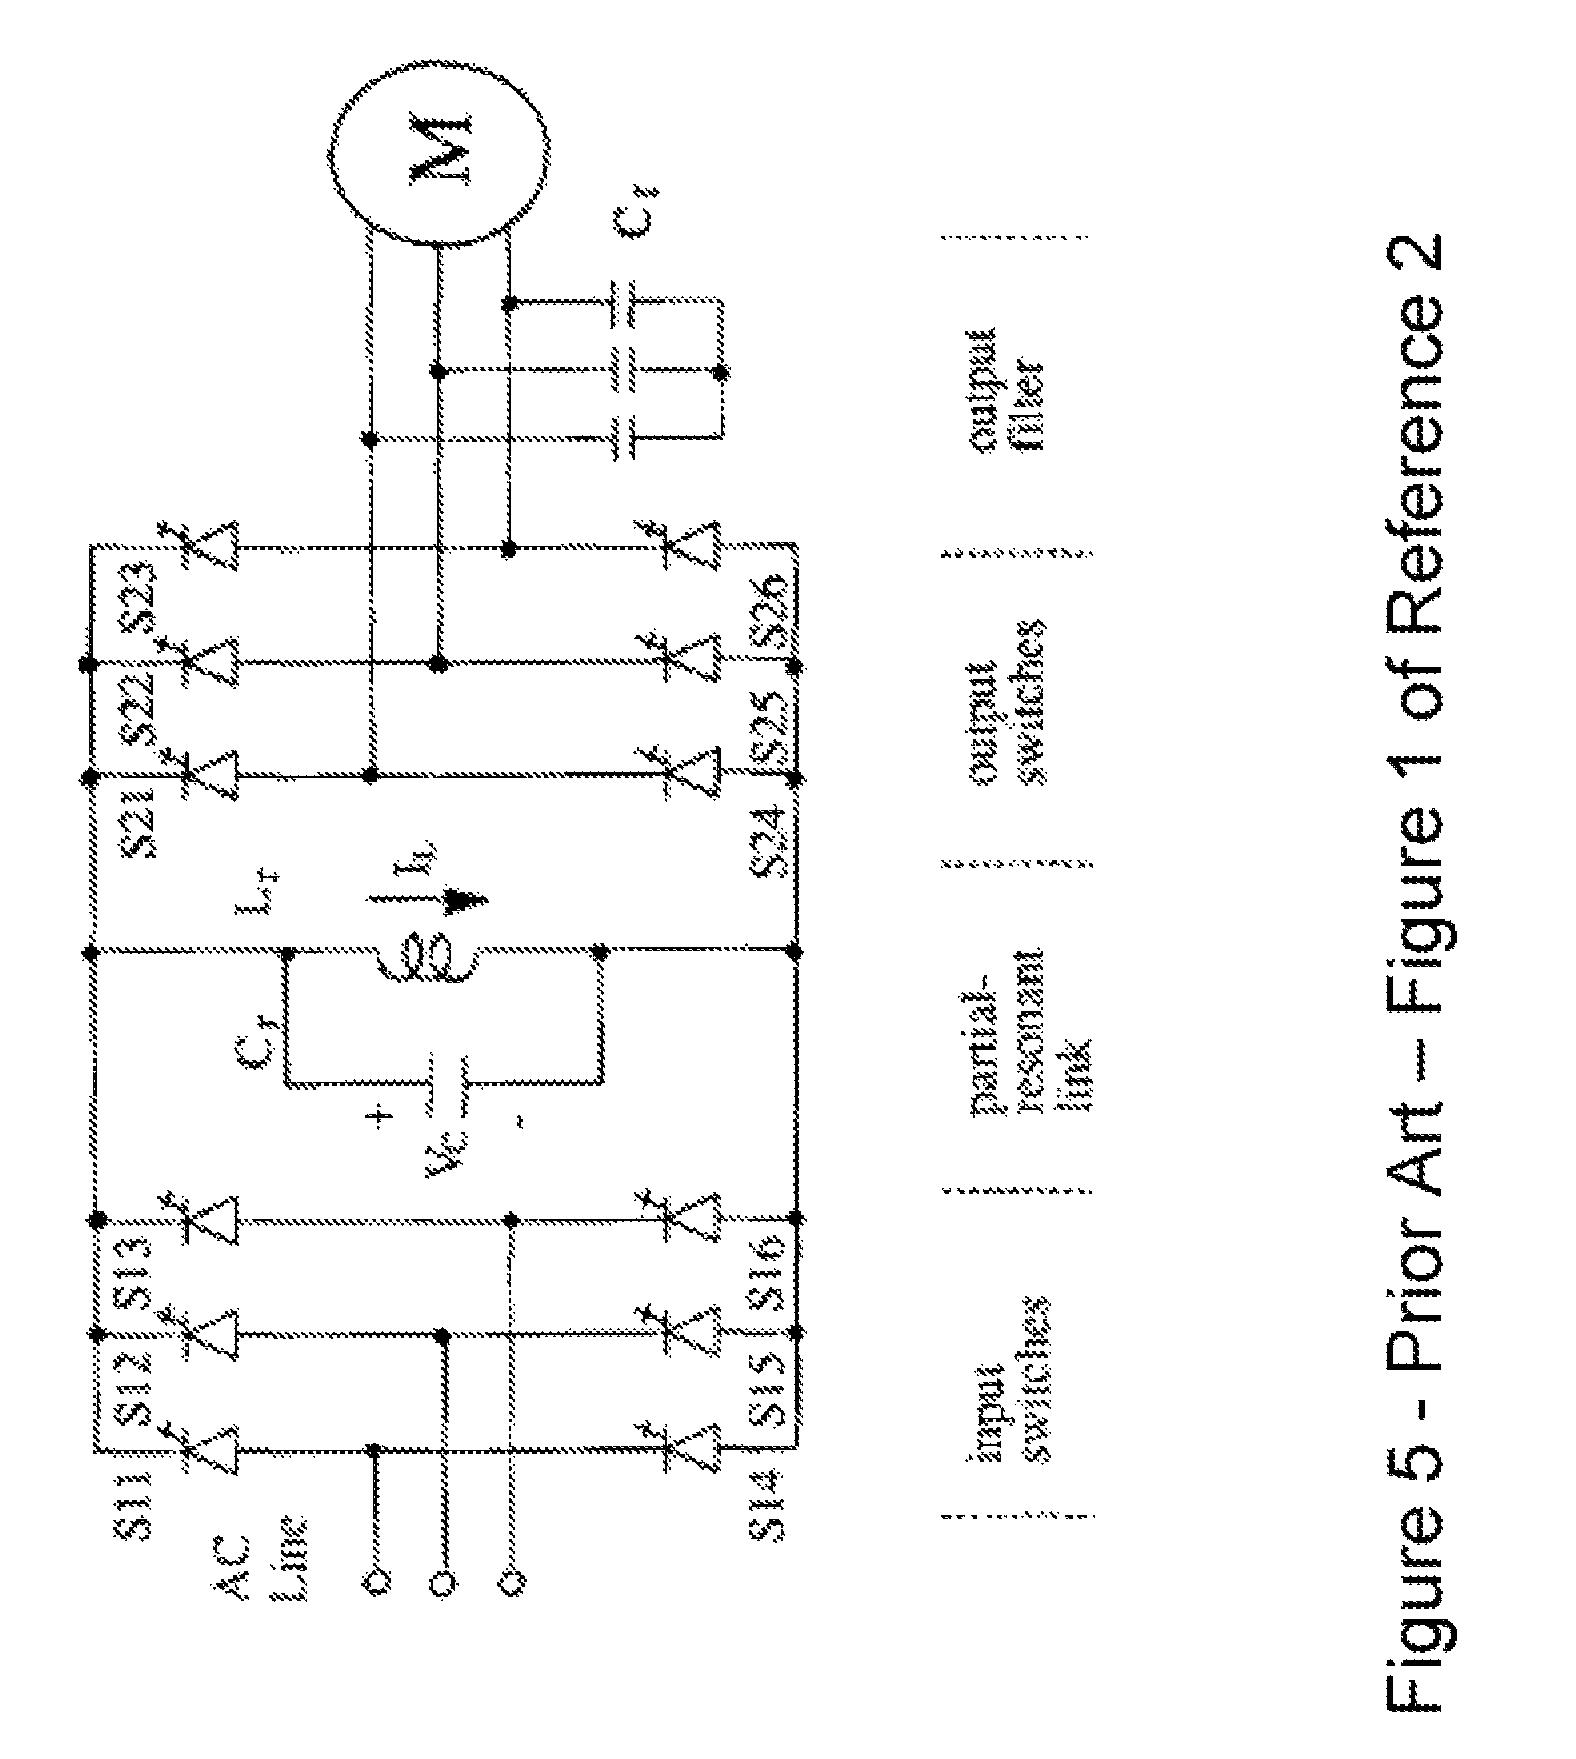 Exhaust Brake Wiring Diagram Somurich Com